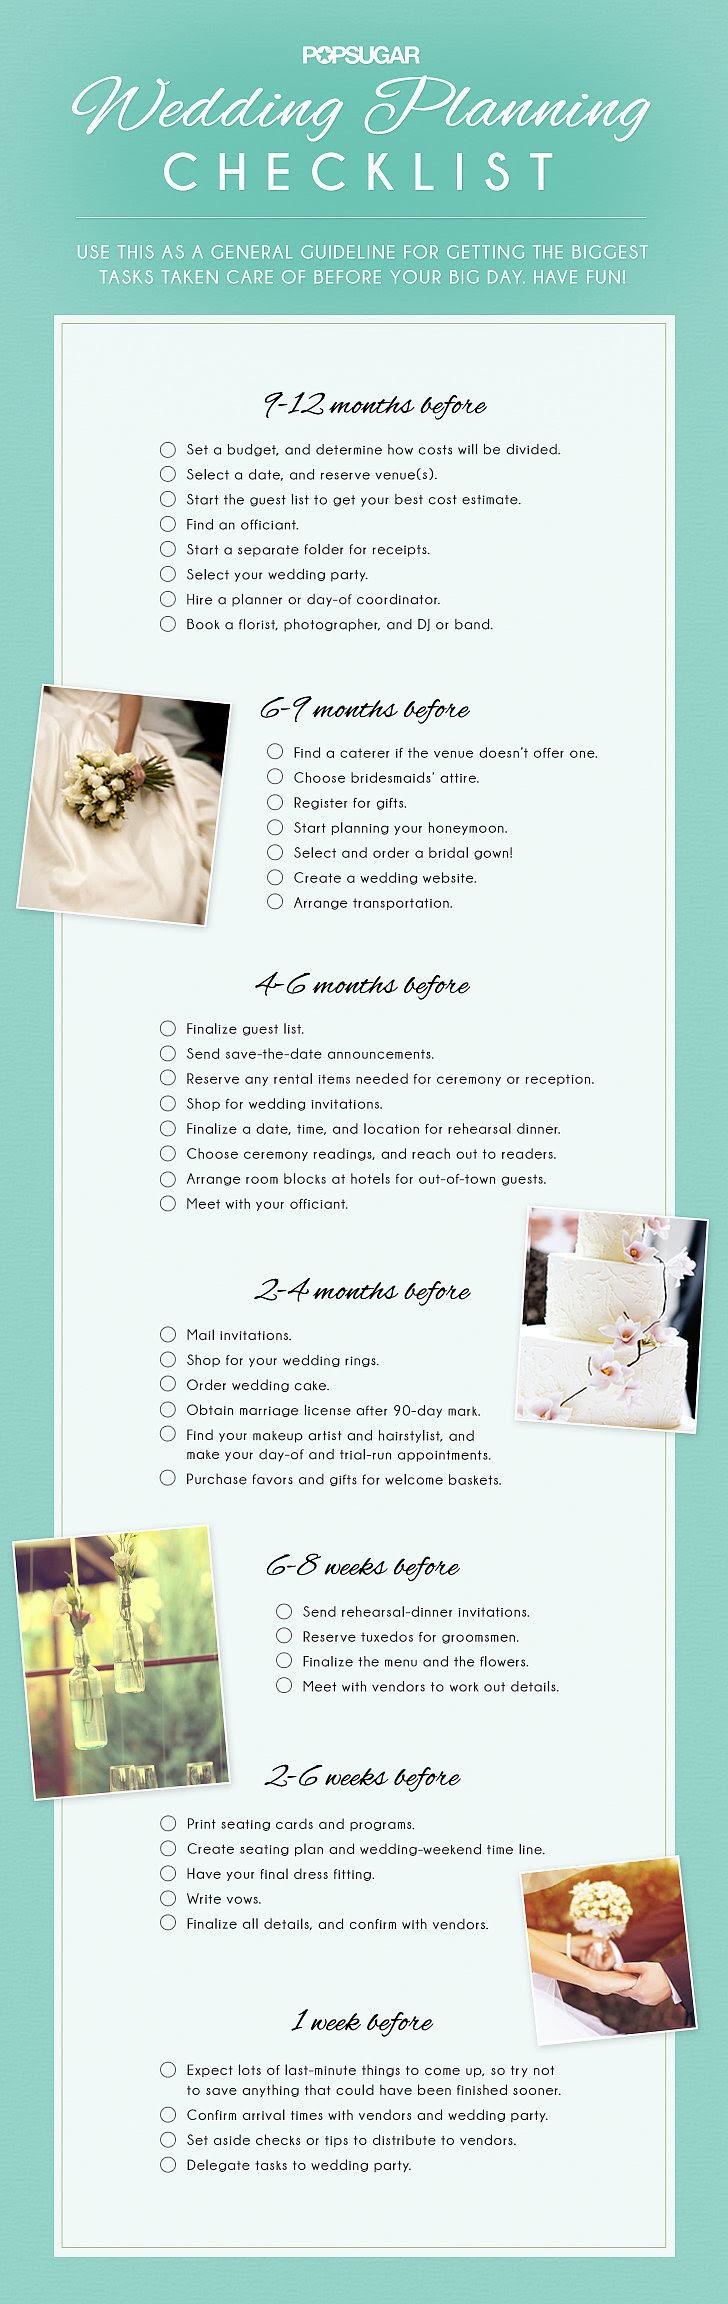 Wedding Planning Checklist | POPSUGAR Smart Living